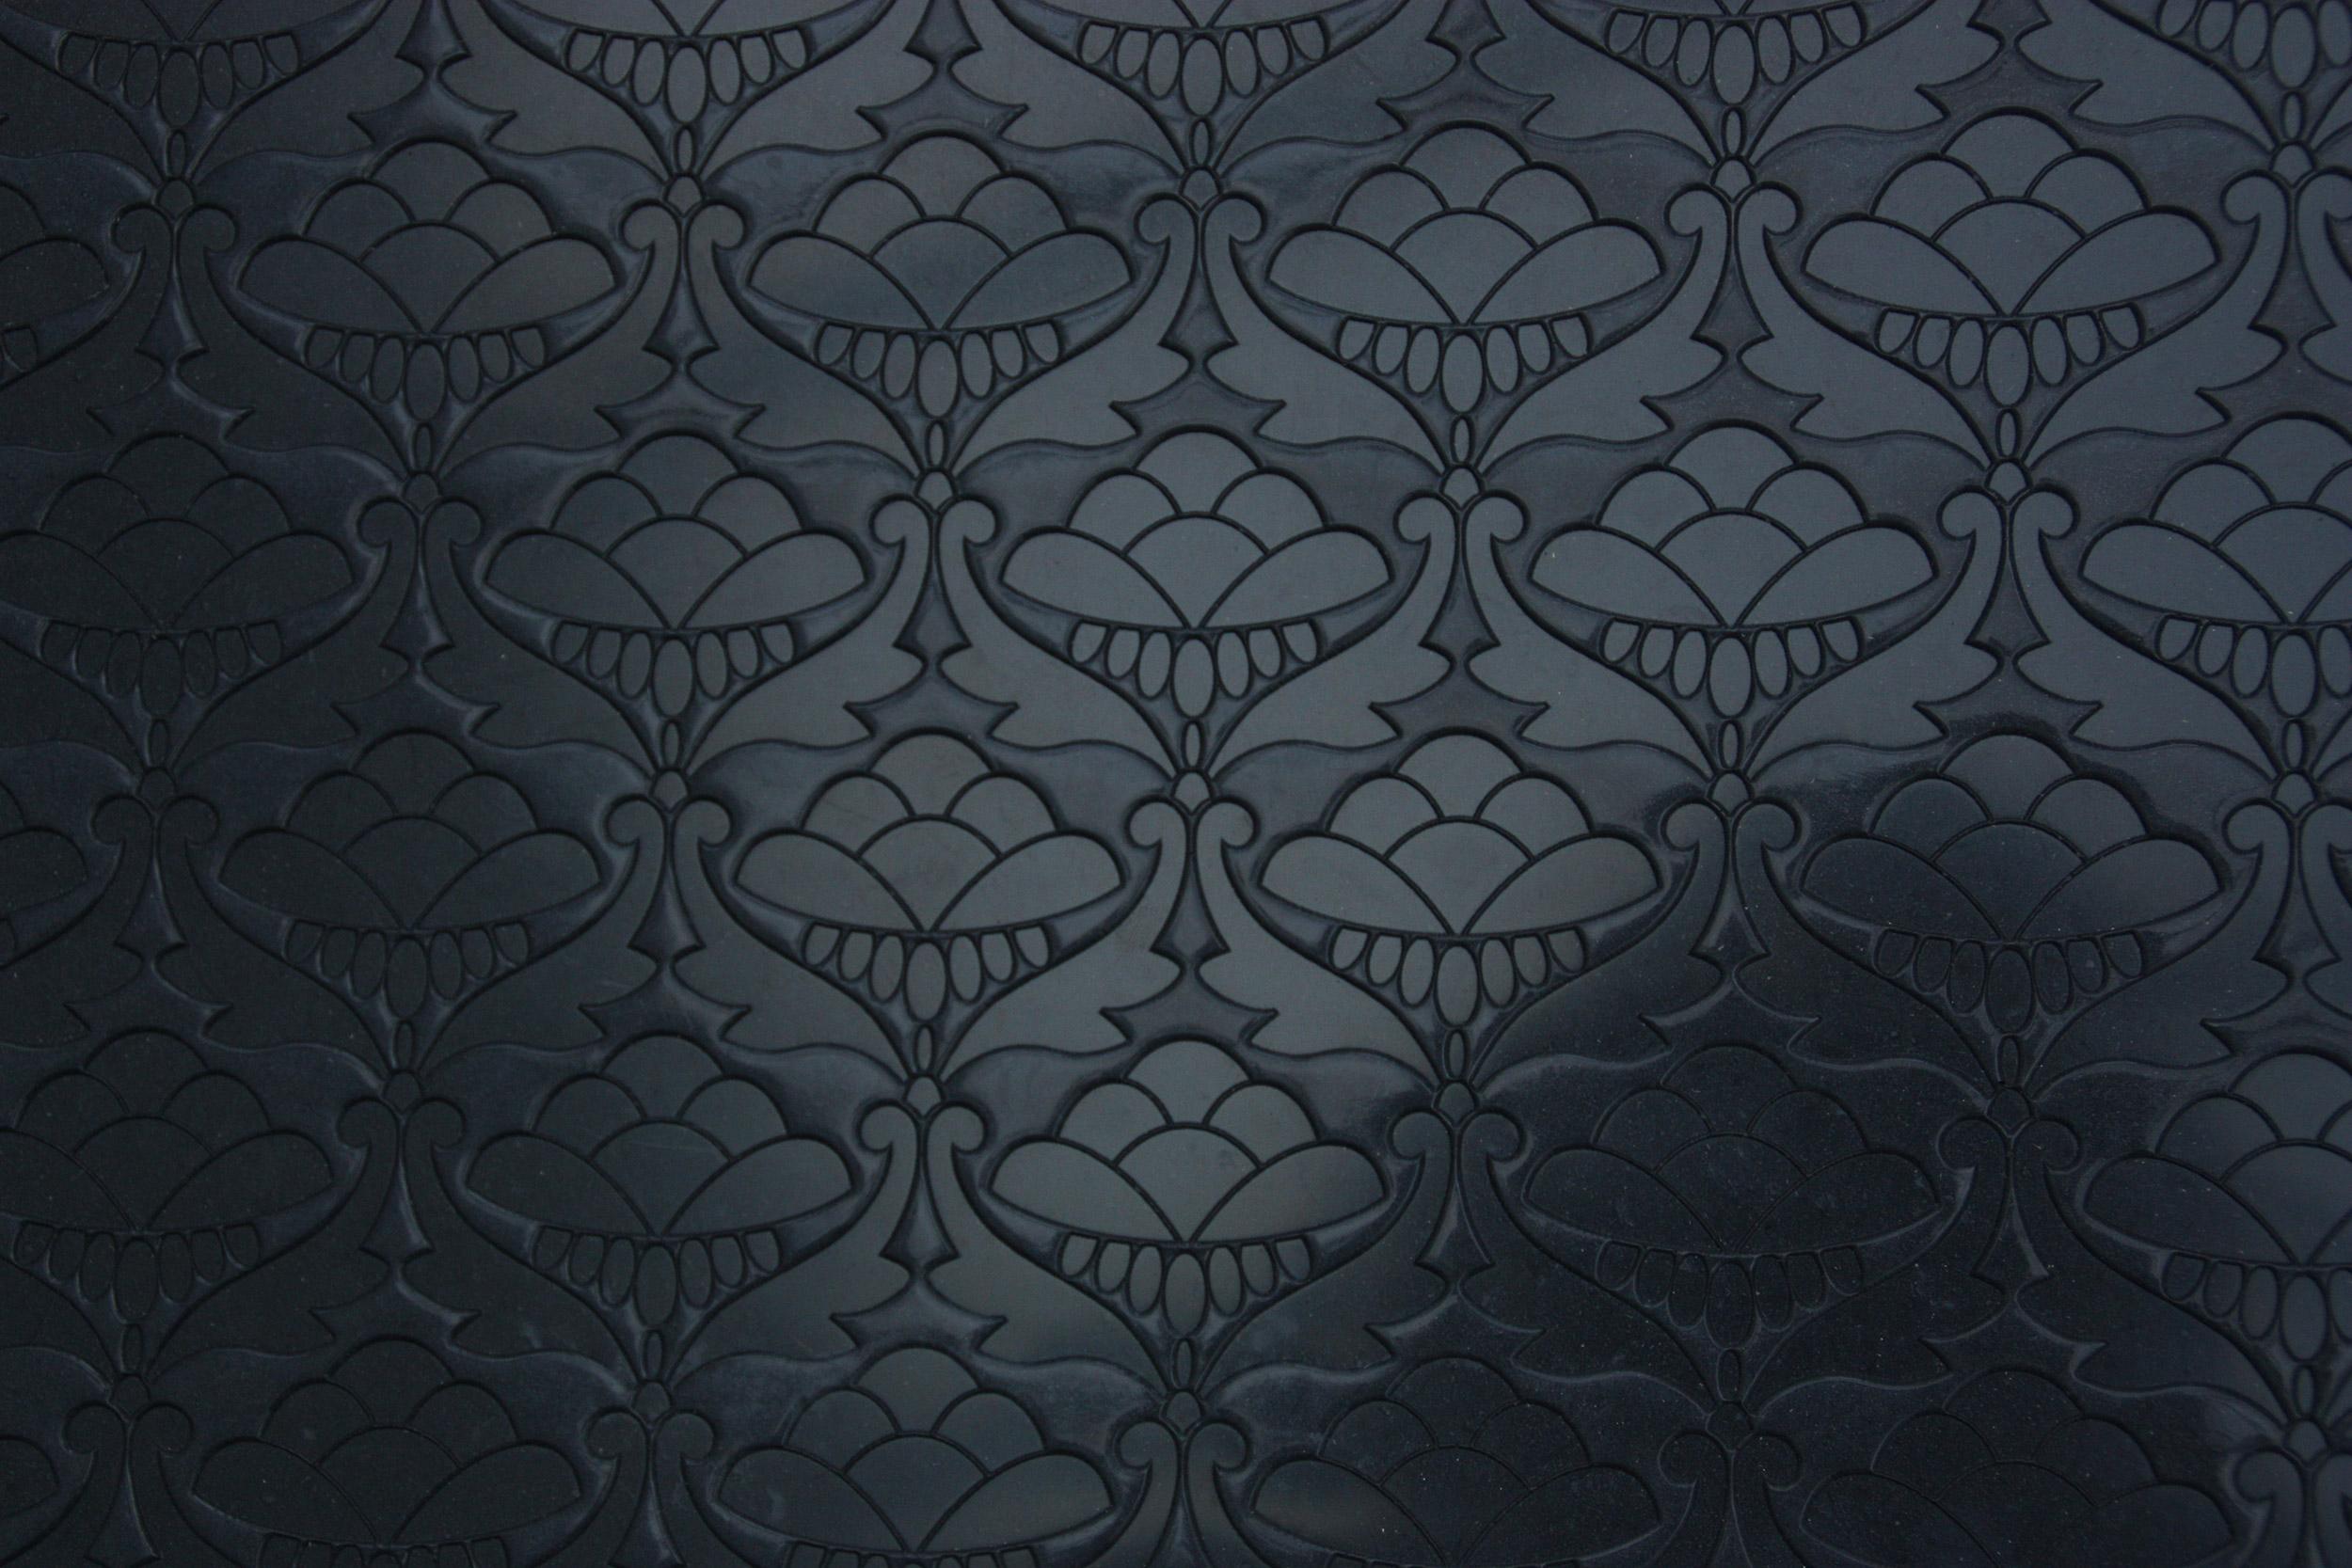 grl_patterns_28.jpg